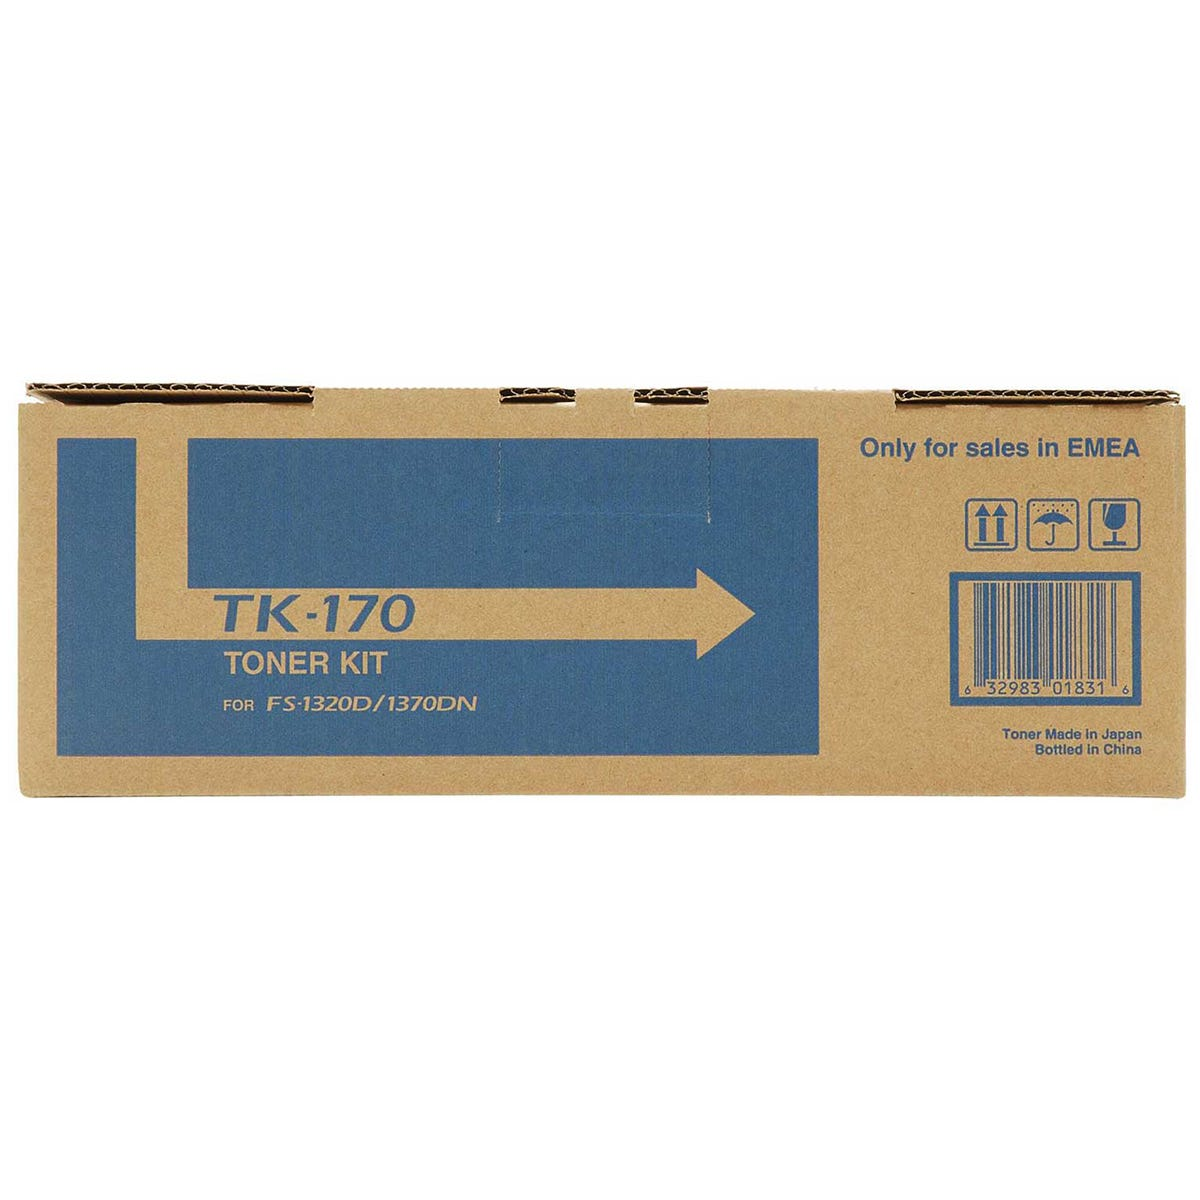 Kyocera TK170 Printer Toner Cartridge, Black